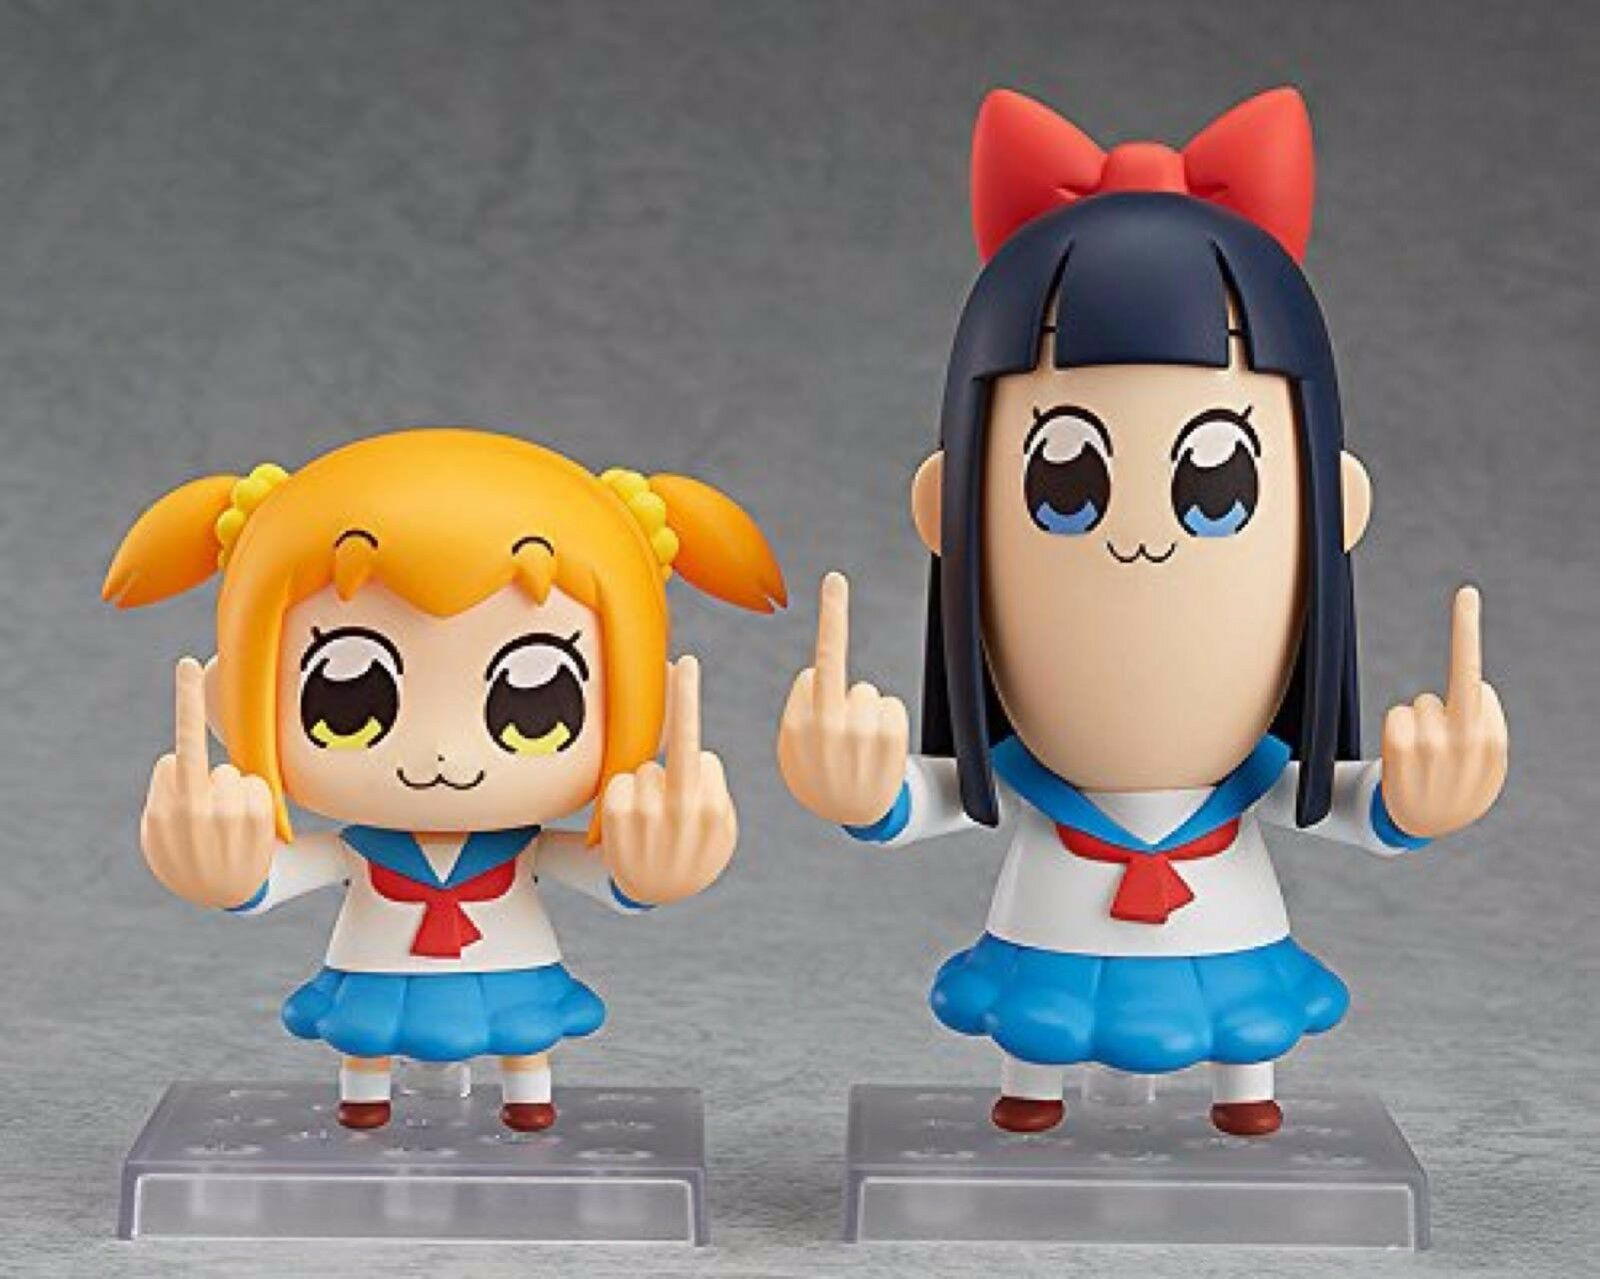 Good Smile Company Nendoroid Pop equipo épico popuko & pipimi setFigura Nuevo F S Japón